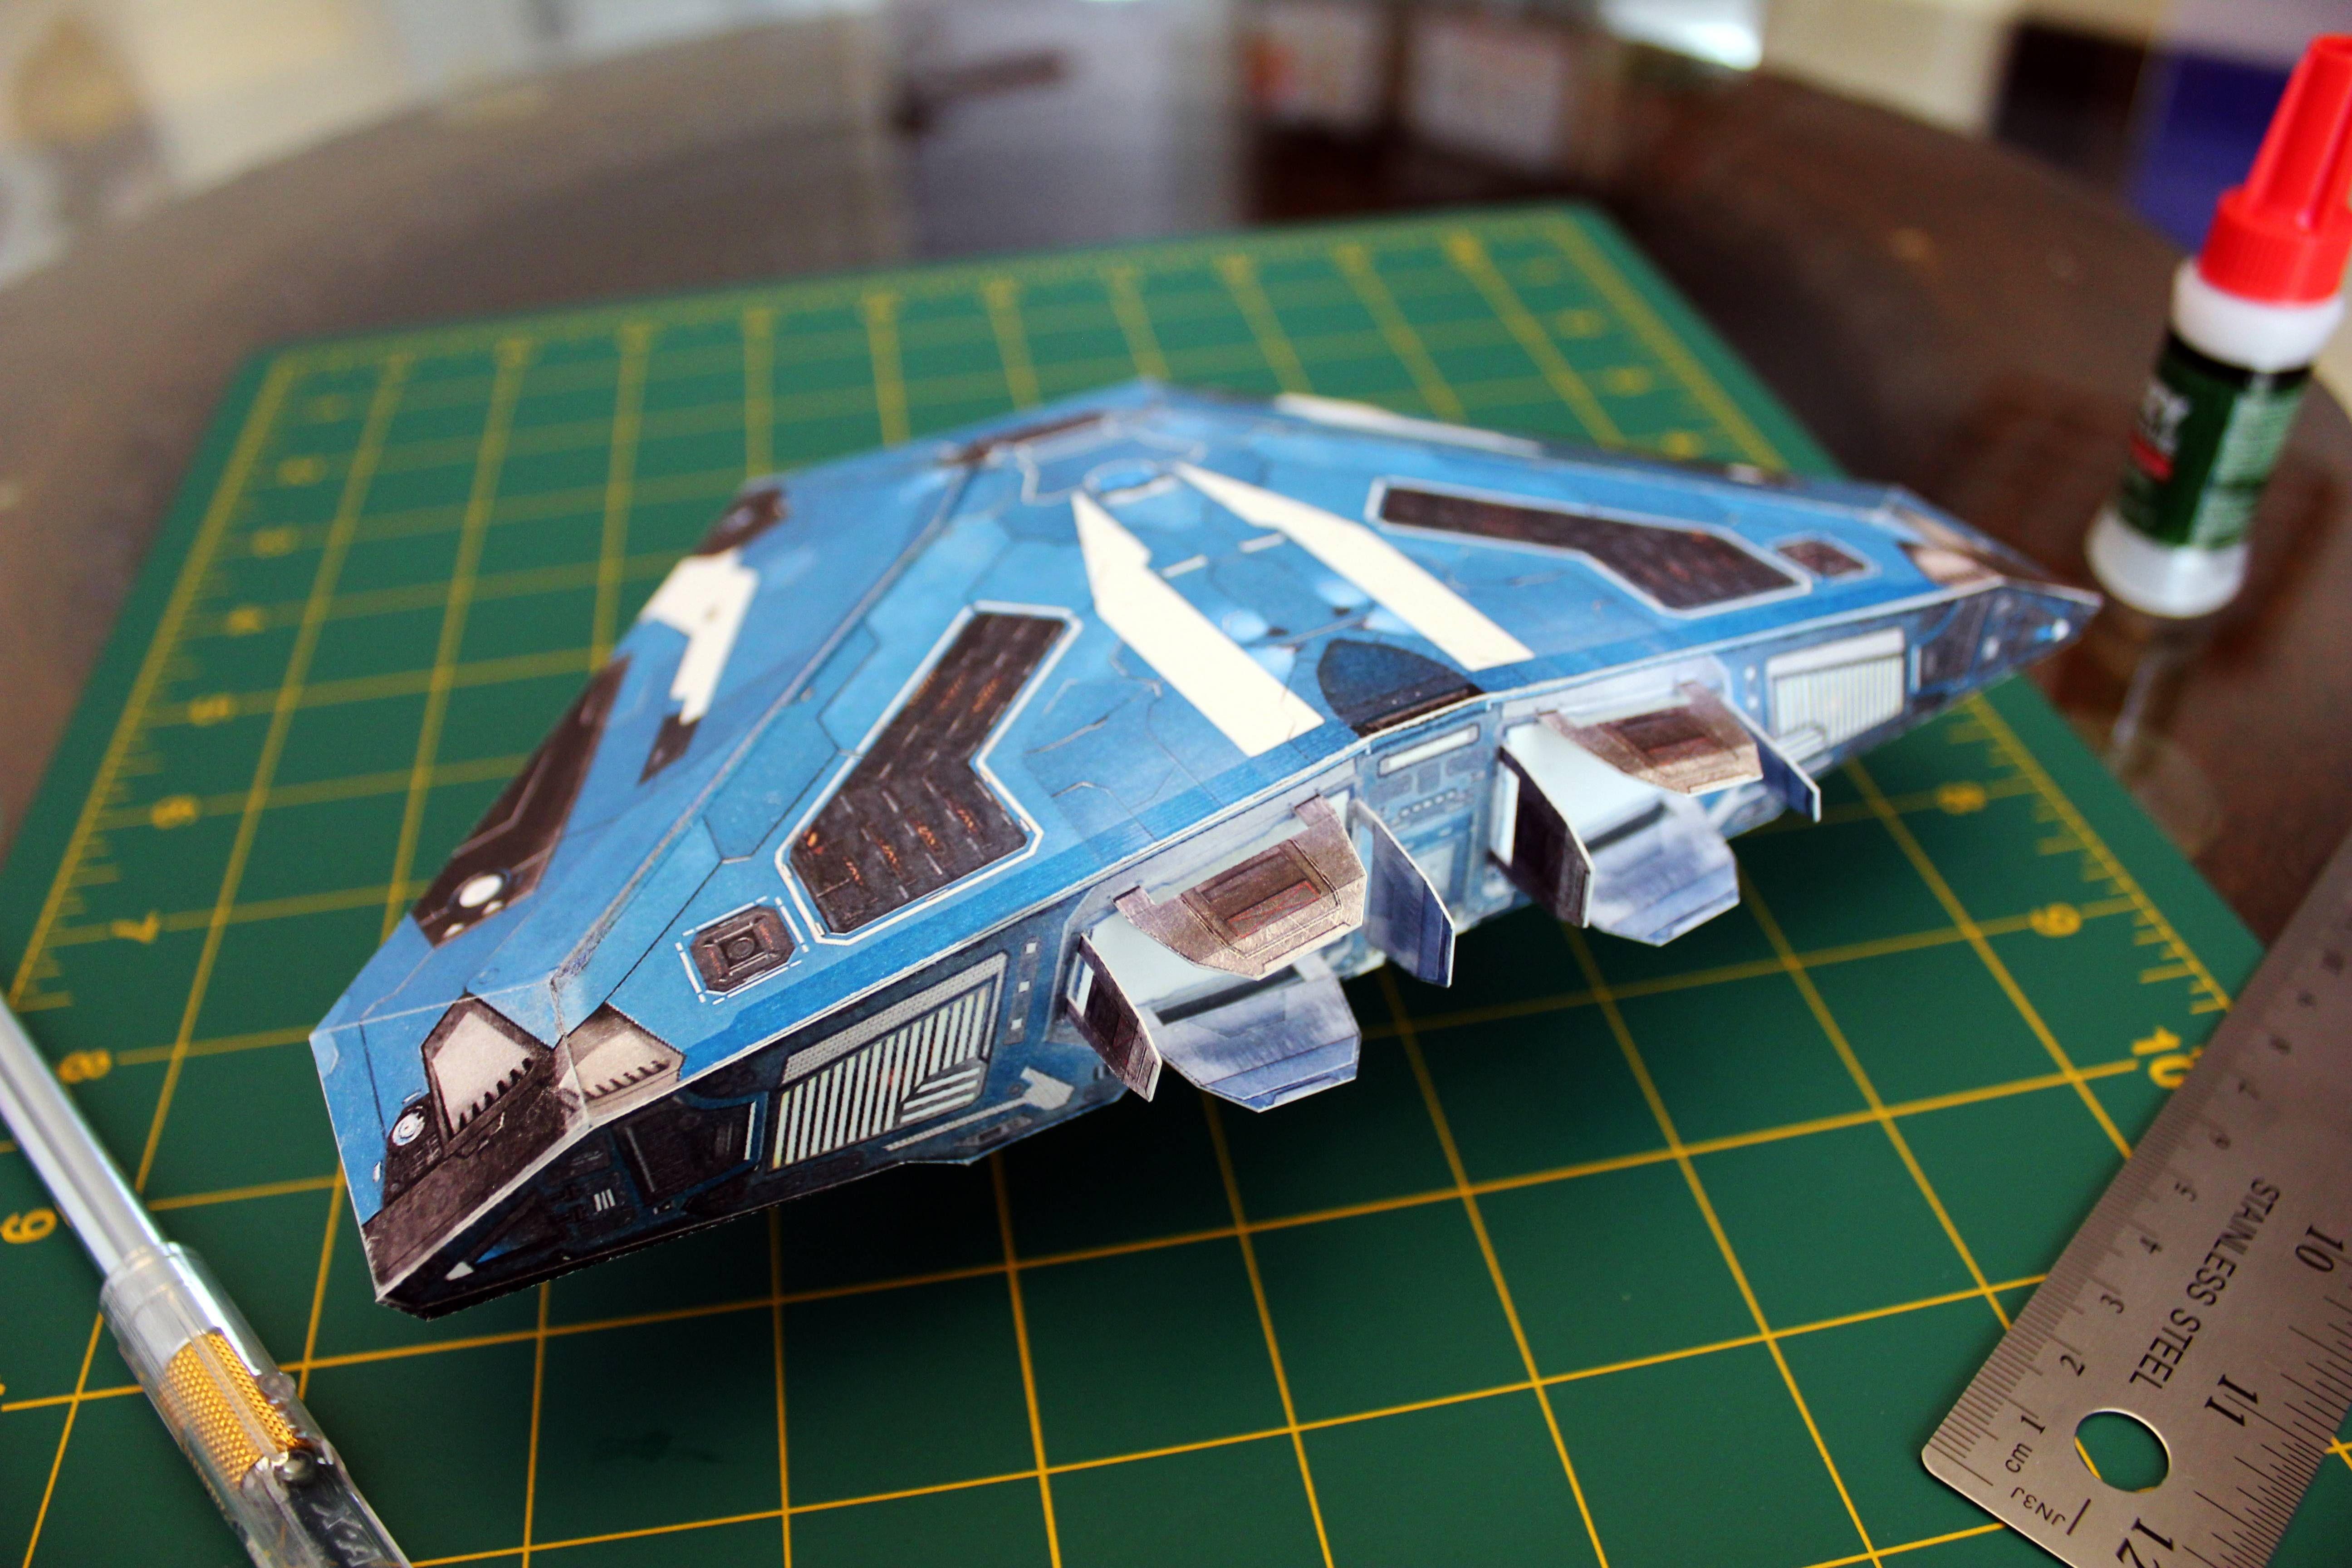 Millenium Falcon Papercraft Elite Dangerous Cobra Mk Iii Papercraft